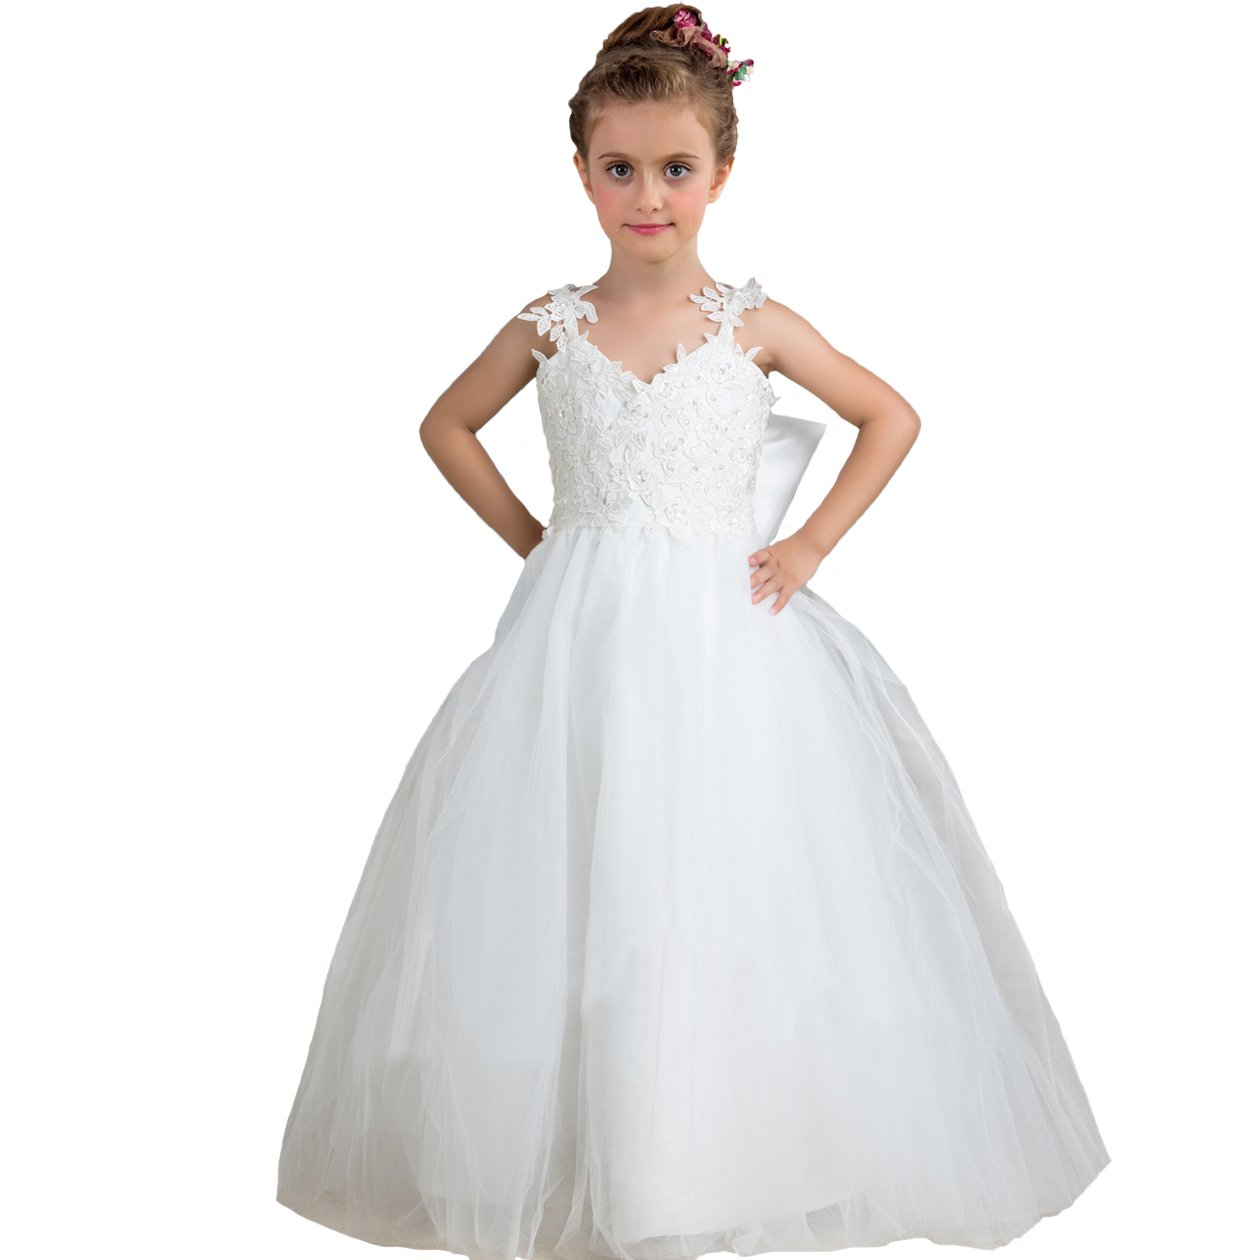 Euro Bear Puffy Toddler Children Dress Gown Flower Girl Dresses Ivory Size 12